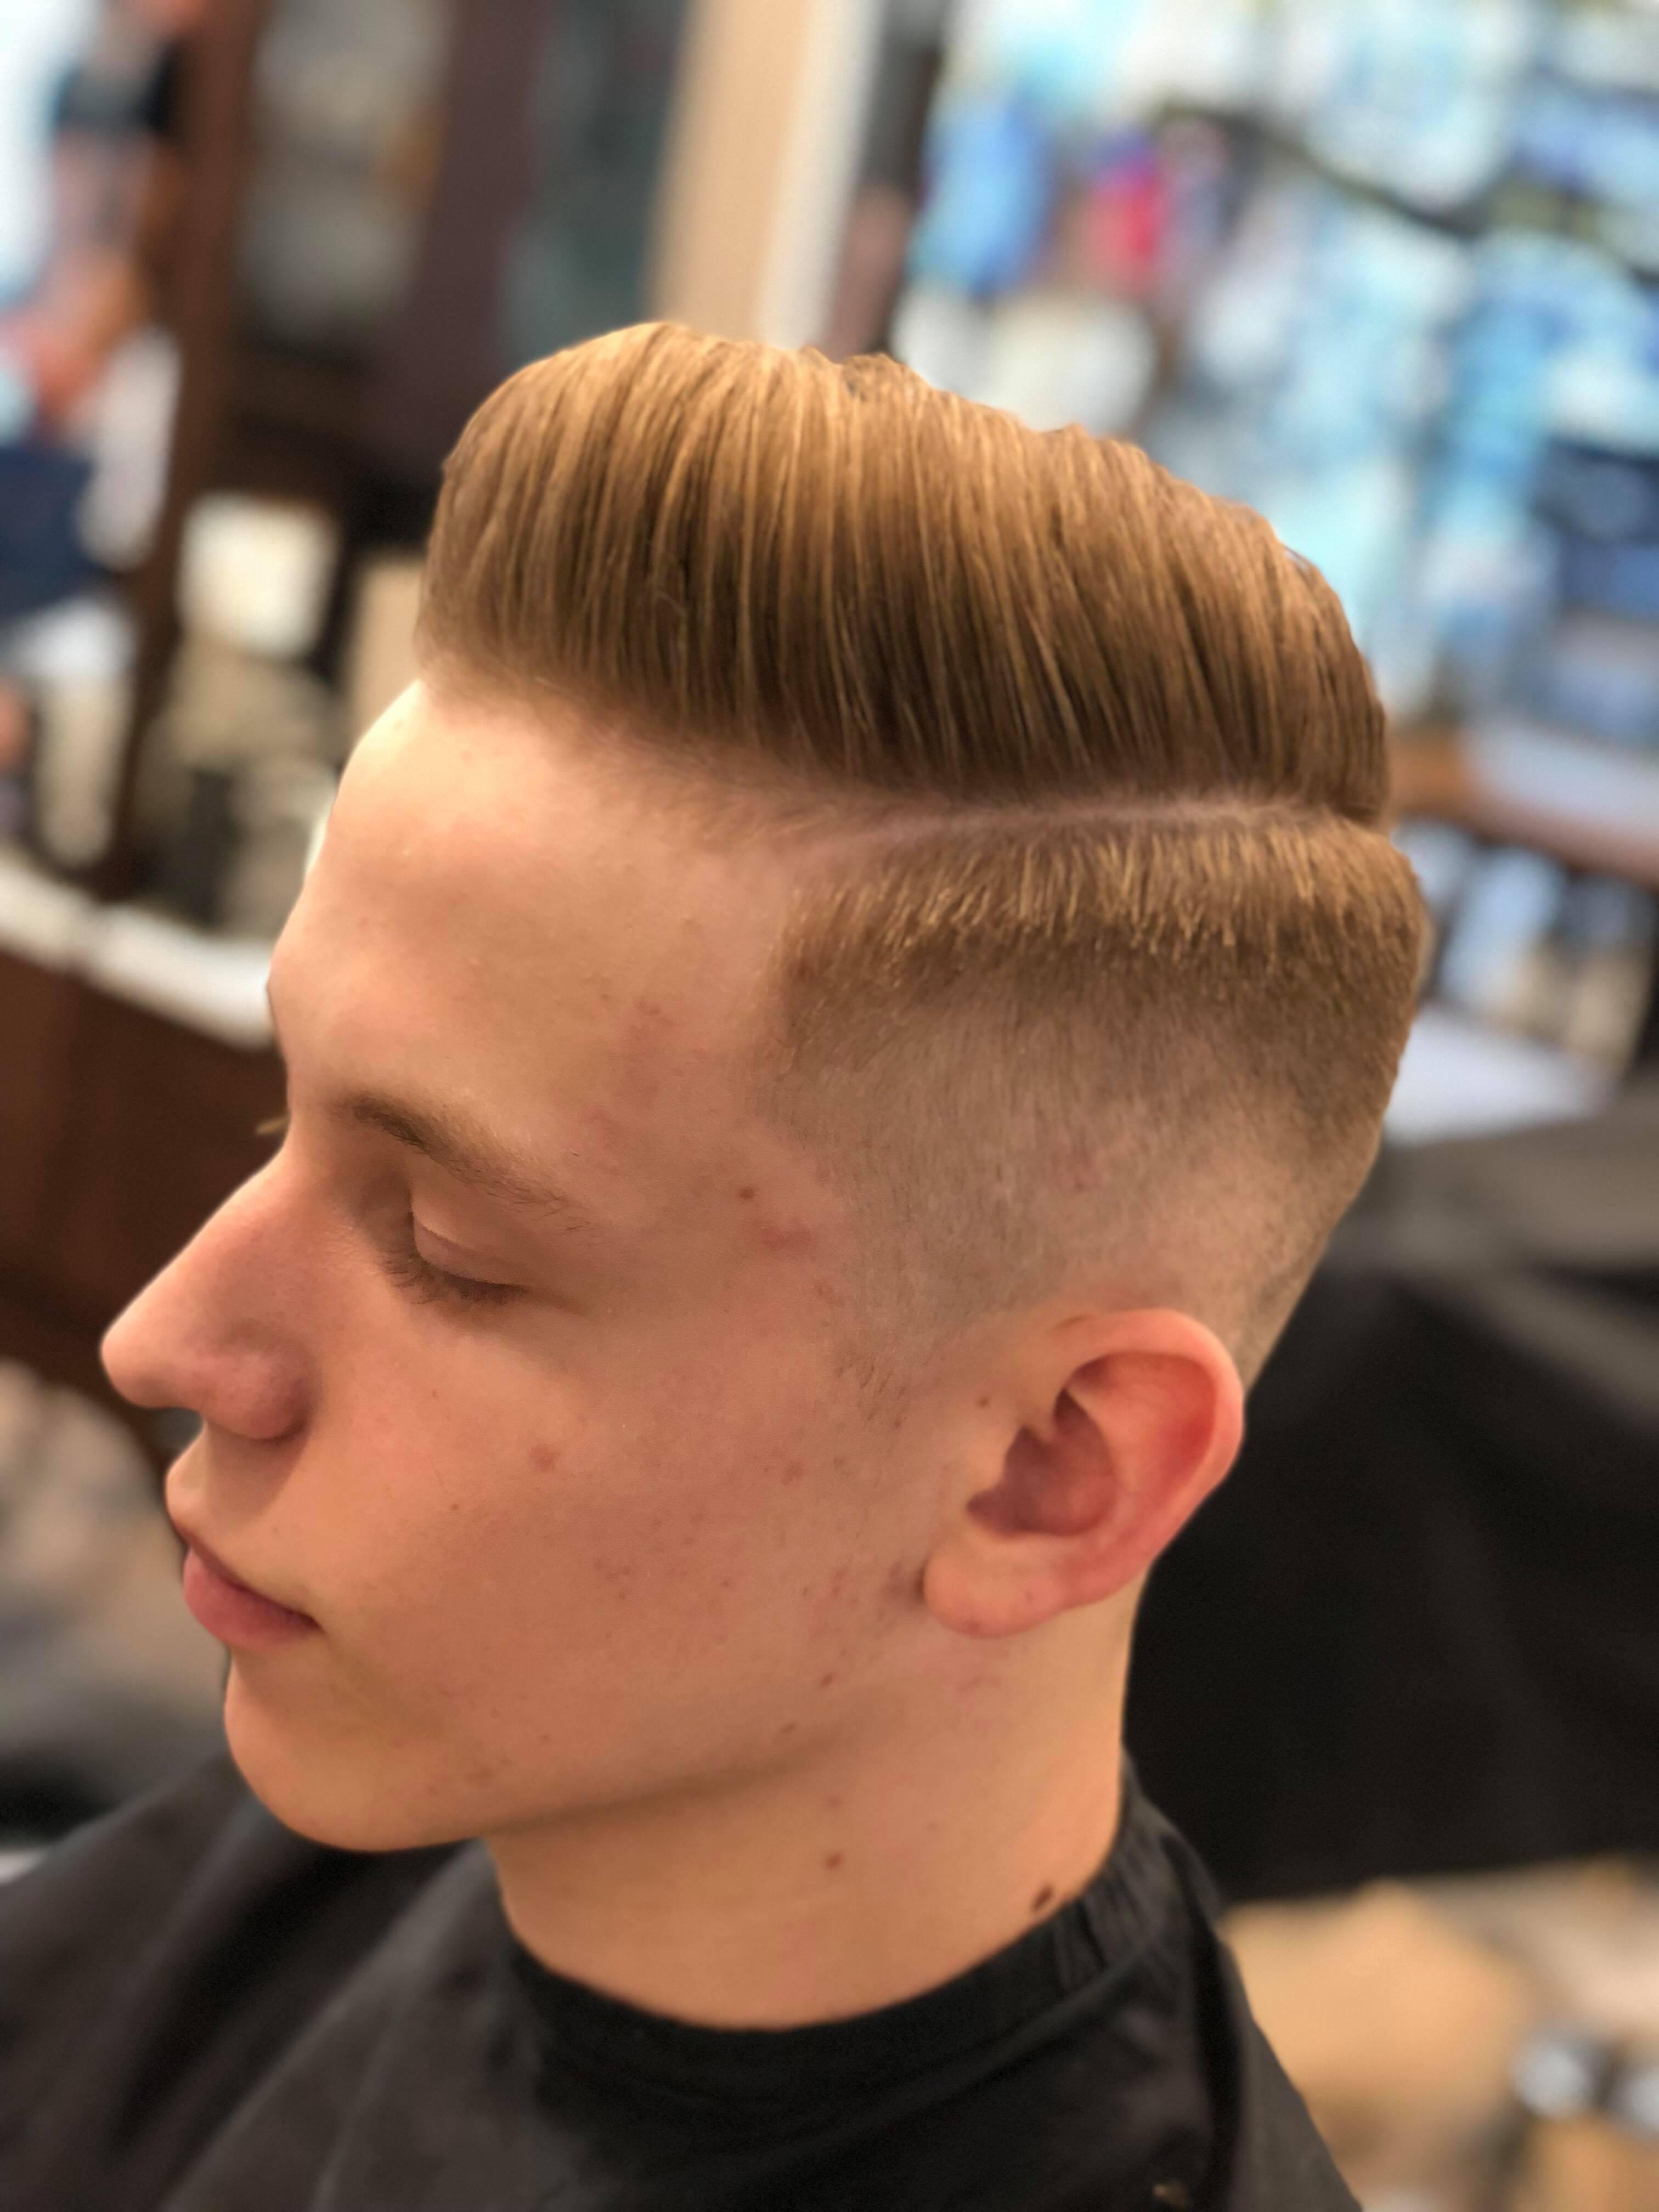 barber shop ferfi hajvagas